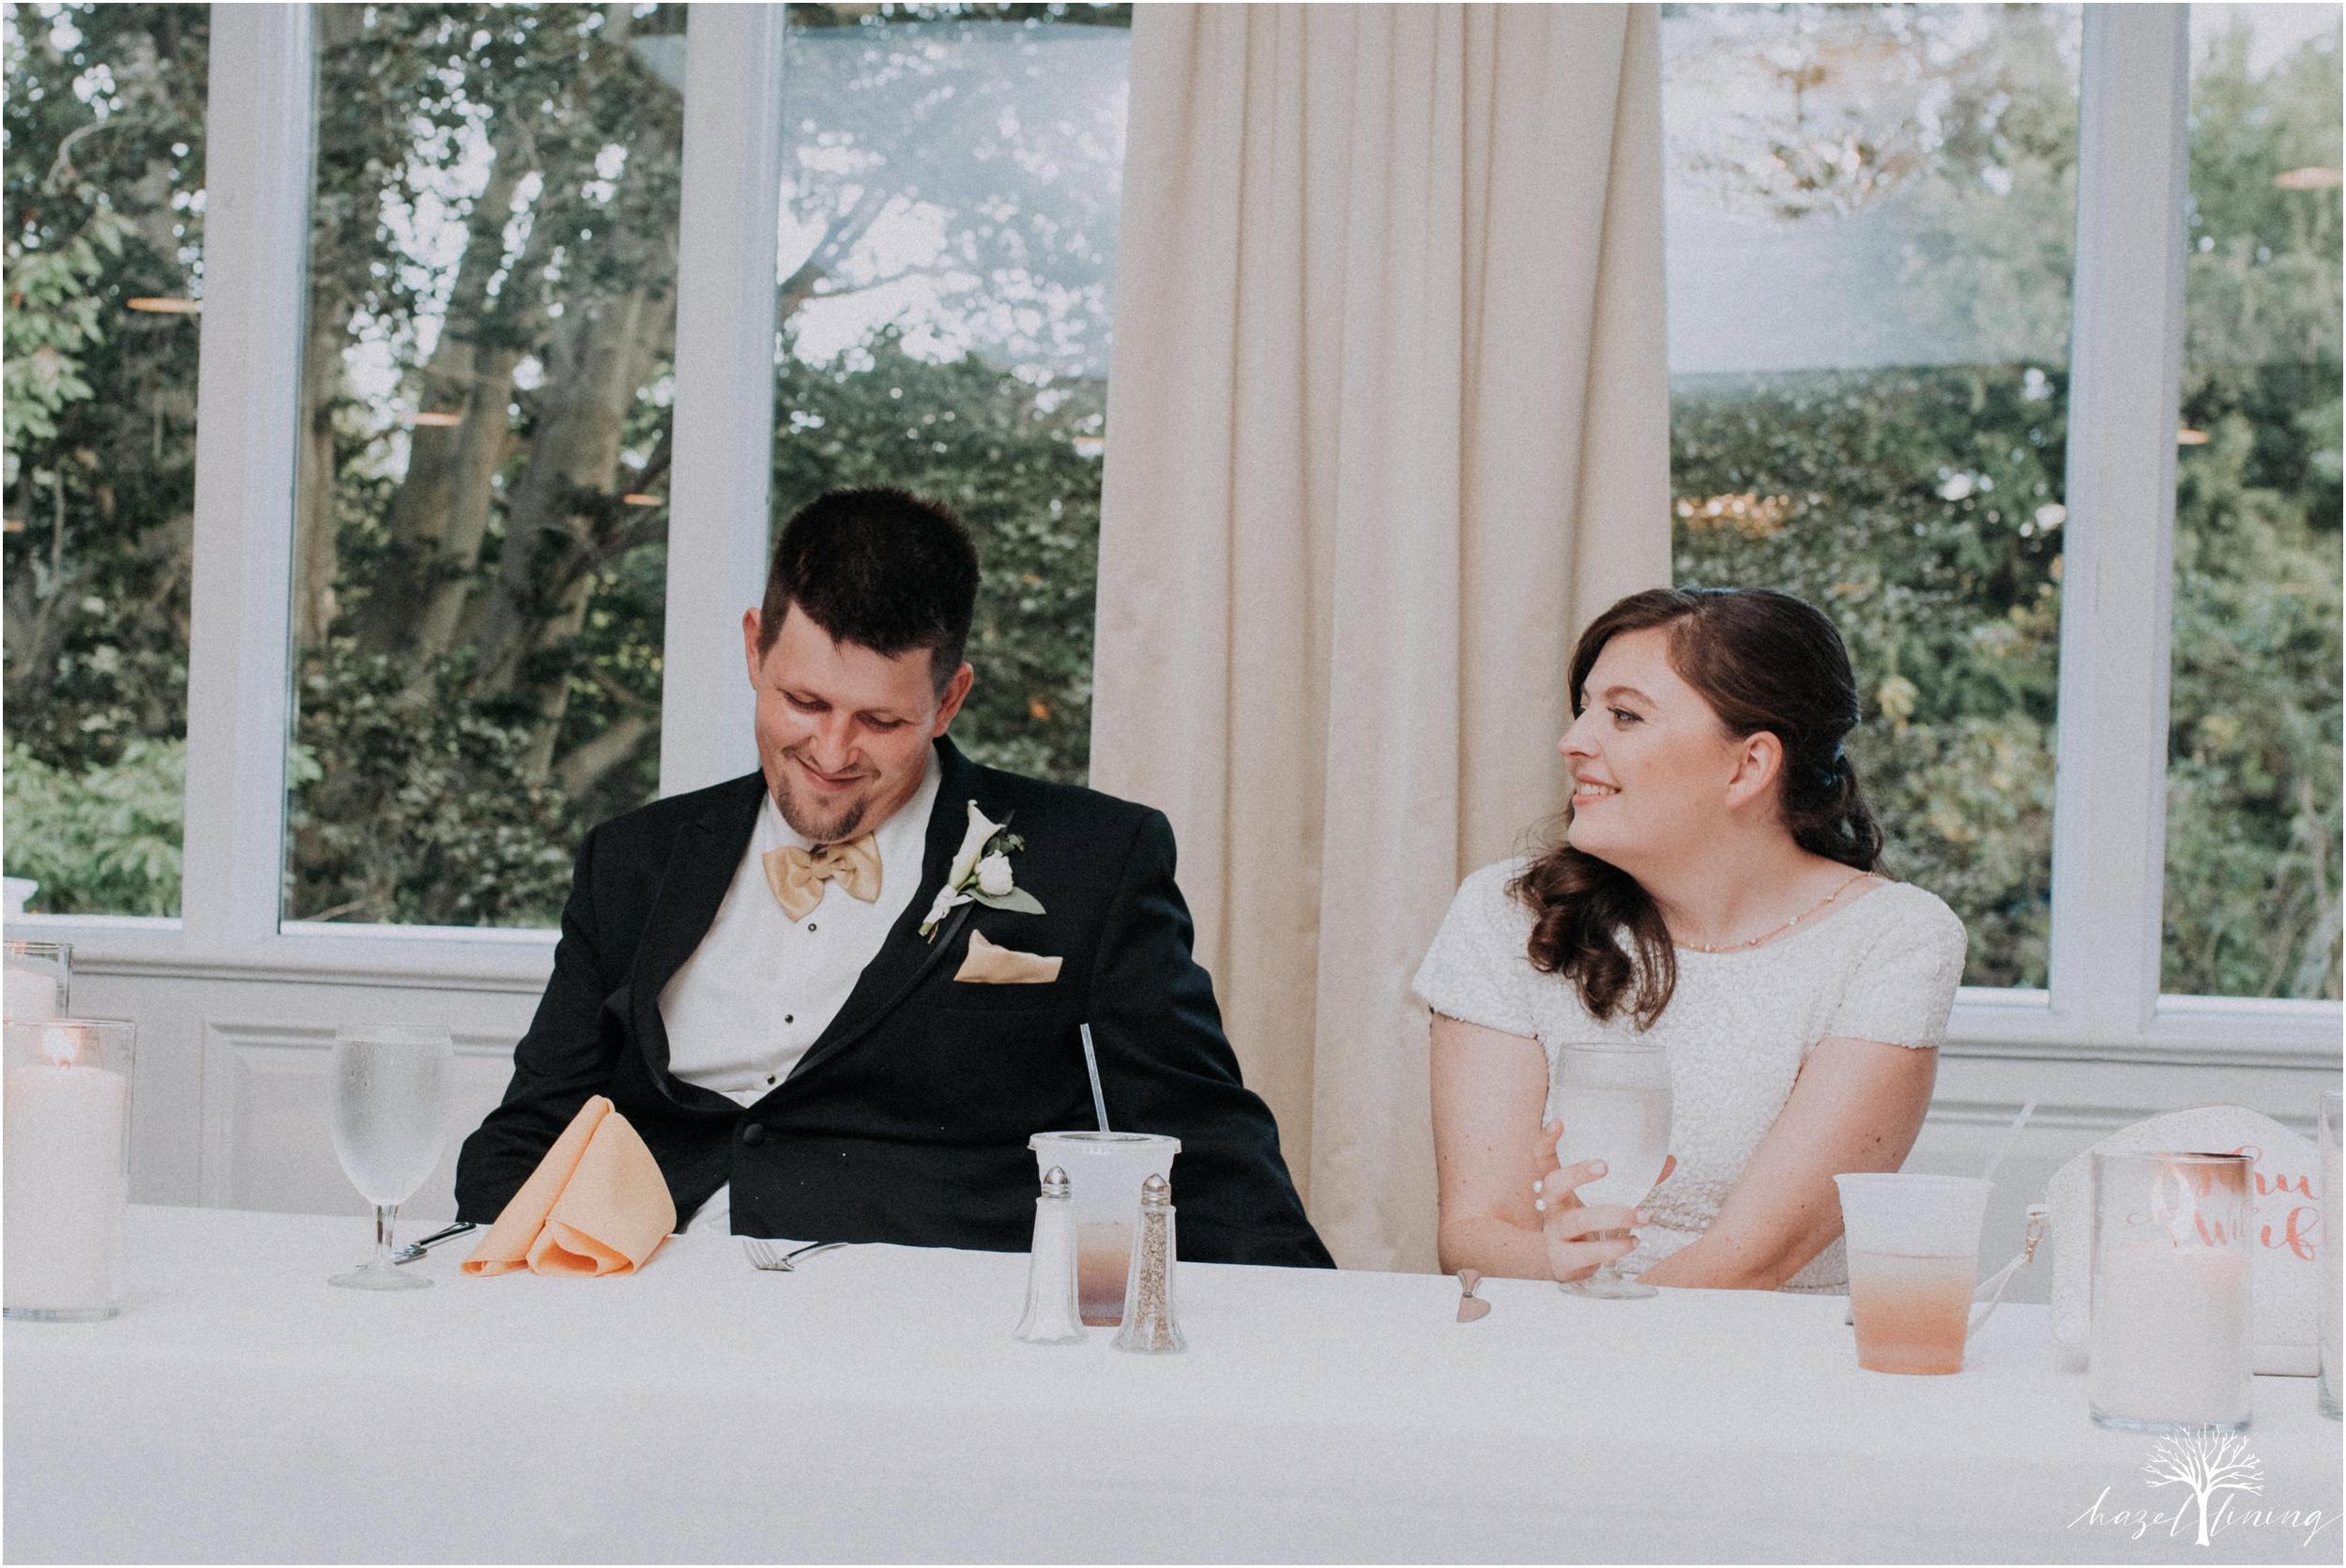 elizabeth-doelp-andrew-foreback-middletown-country-club-summer-langhorne-pennsylvania-wedding-hazel-lining-travel-wedding-elopement-photography_0139.jpg